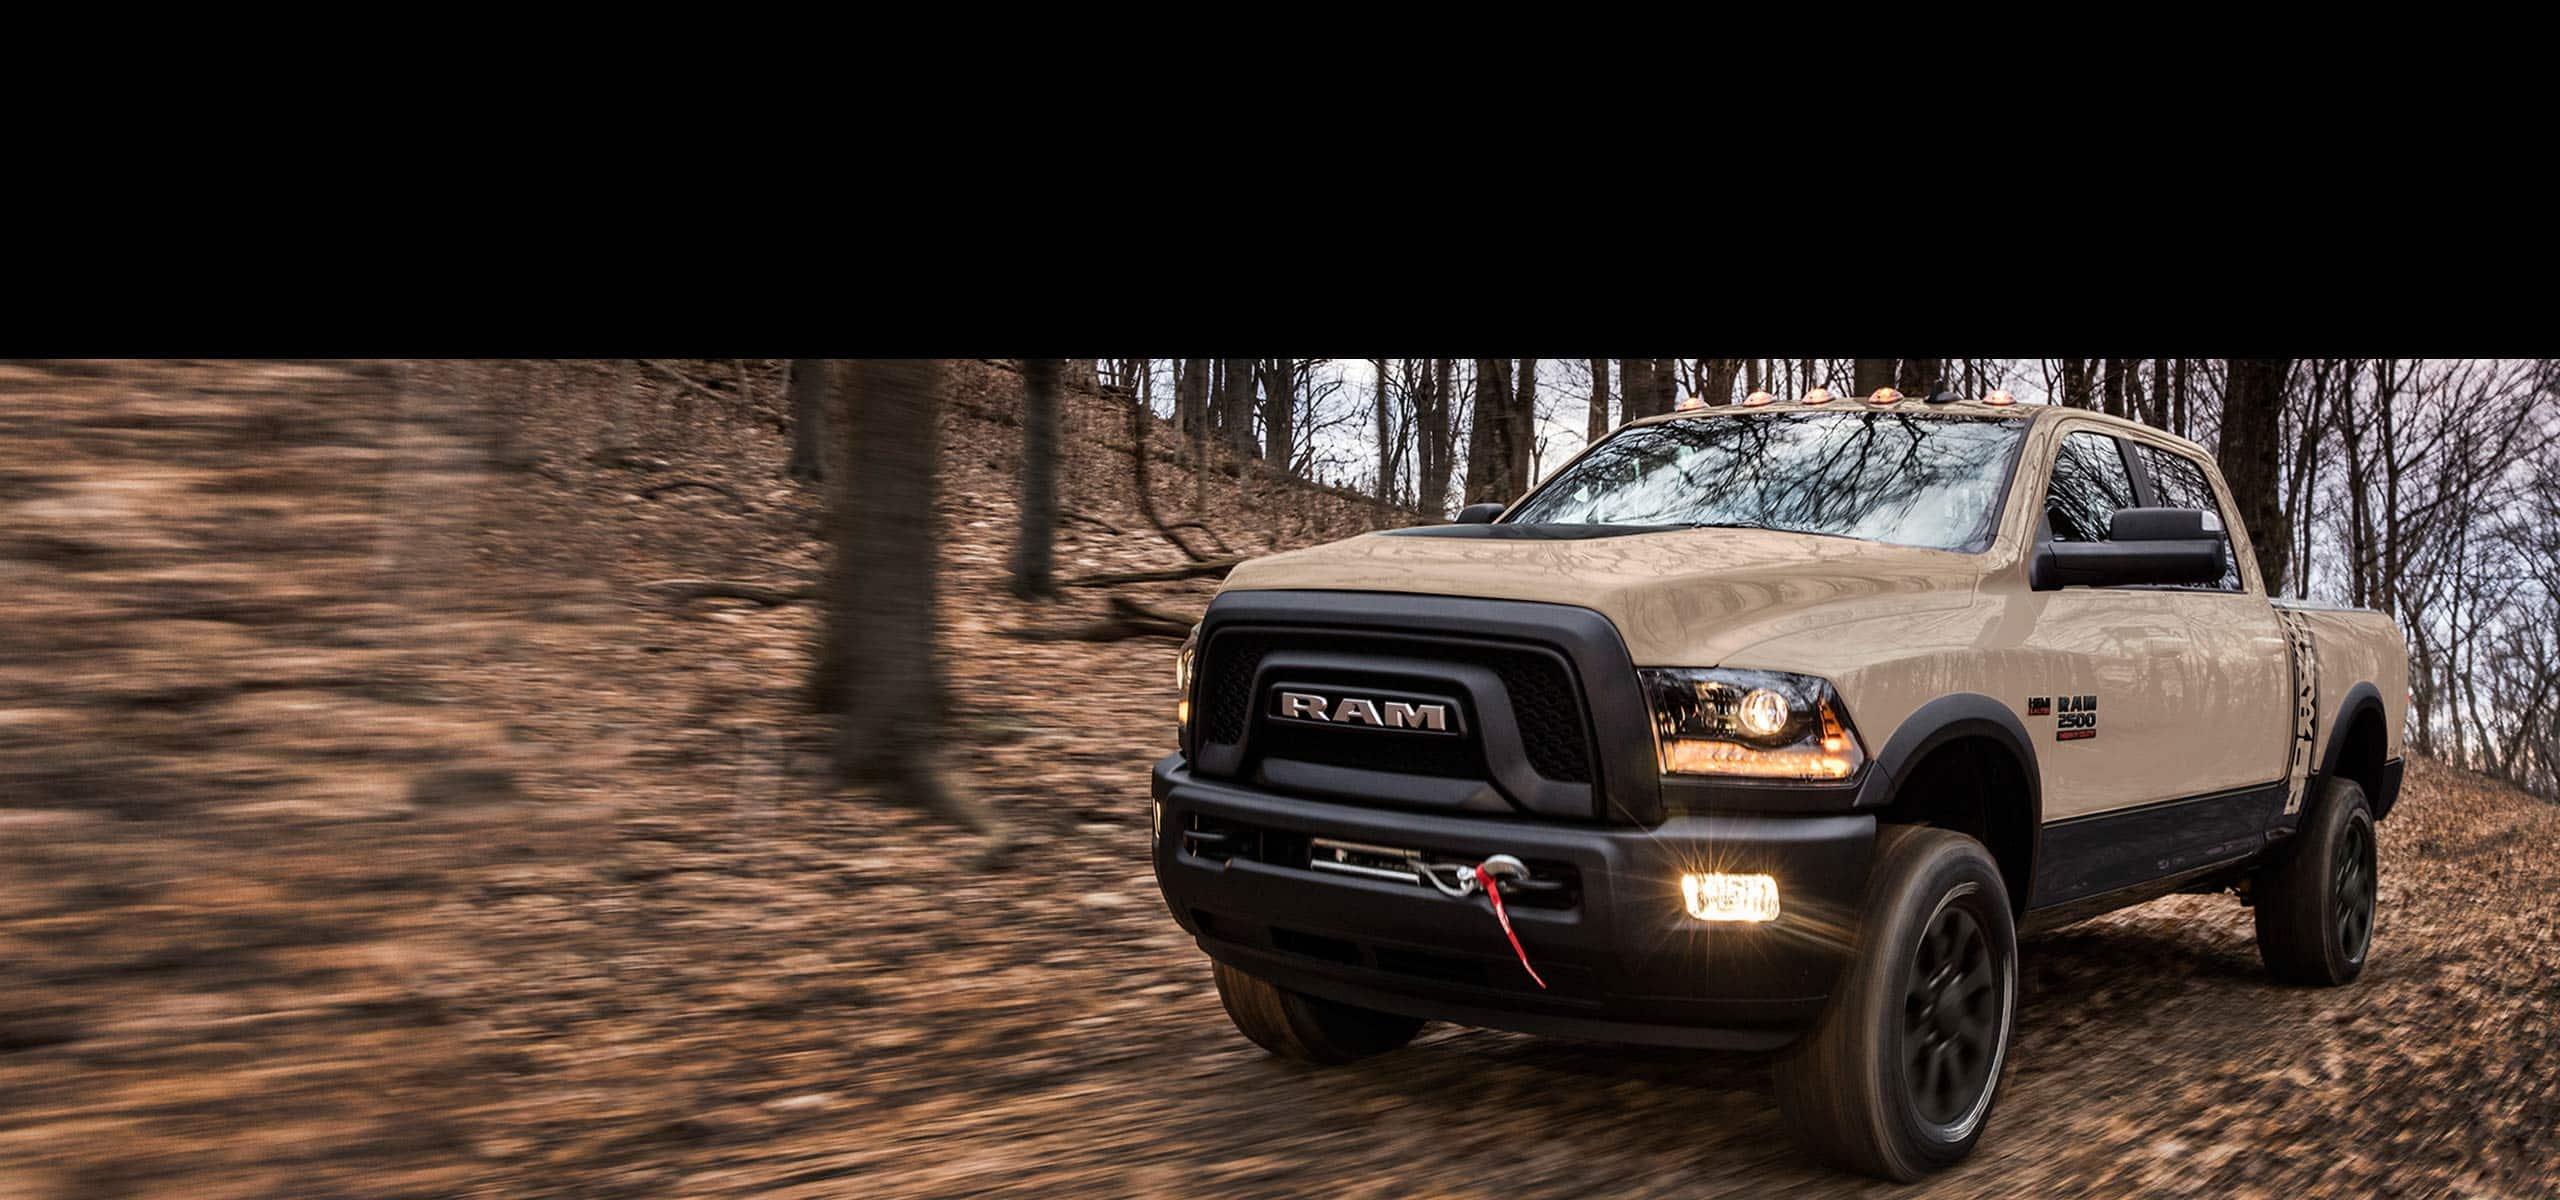 2018 Ram 2500 Power Wagon Mojave Sand Edition Ram Trucks